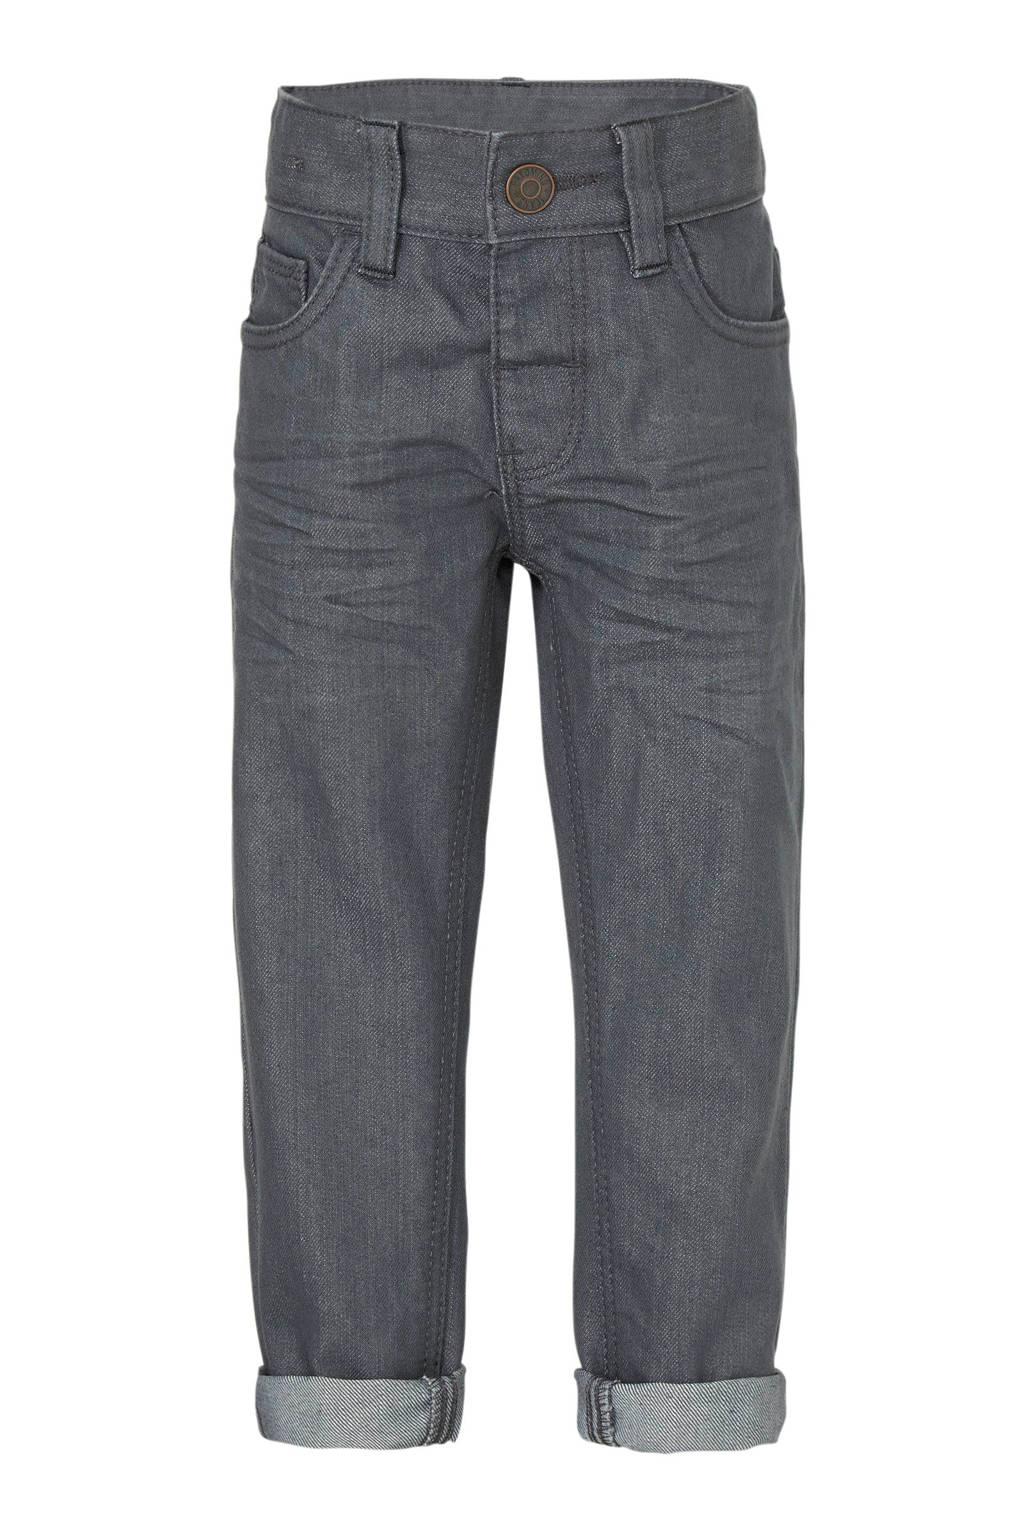 C&A Palomino jeans grijs/dark denim - set van 2, Grijs/dark denim